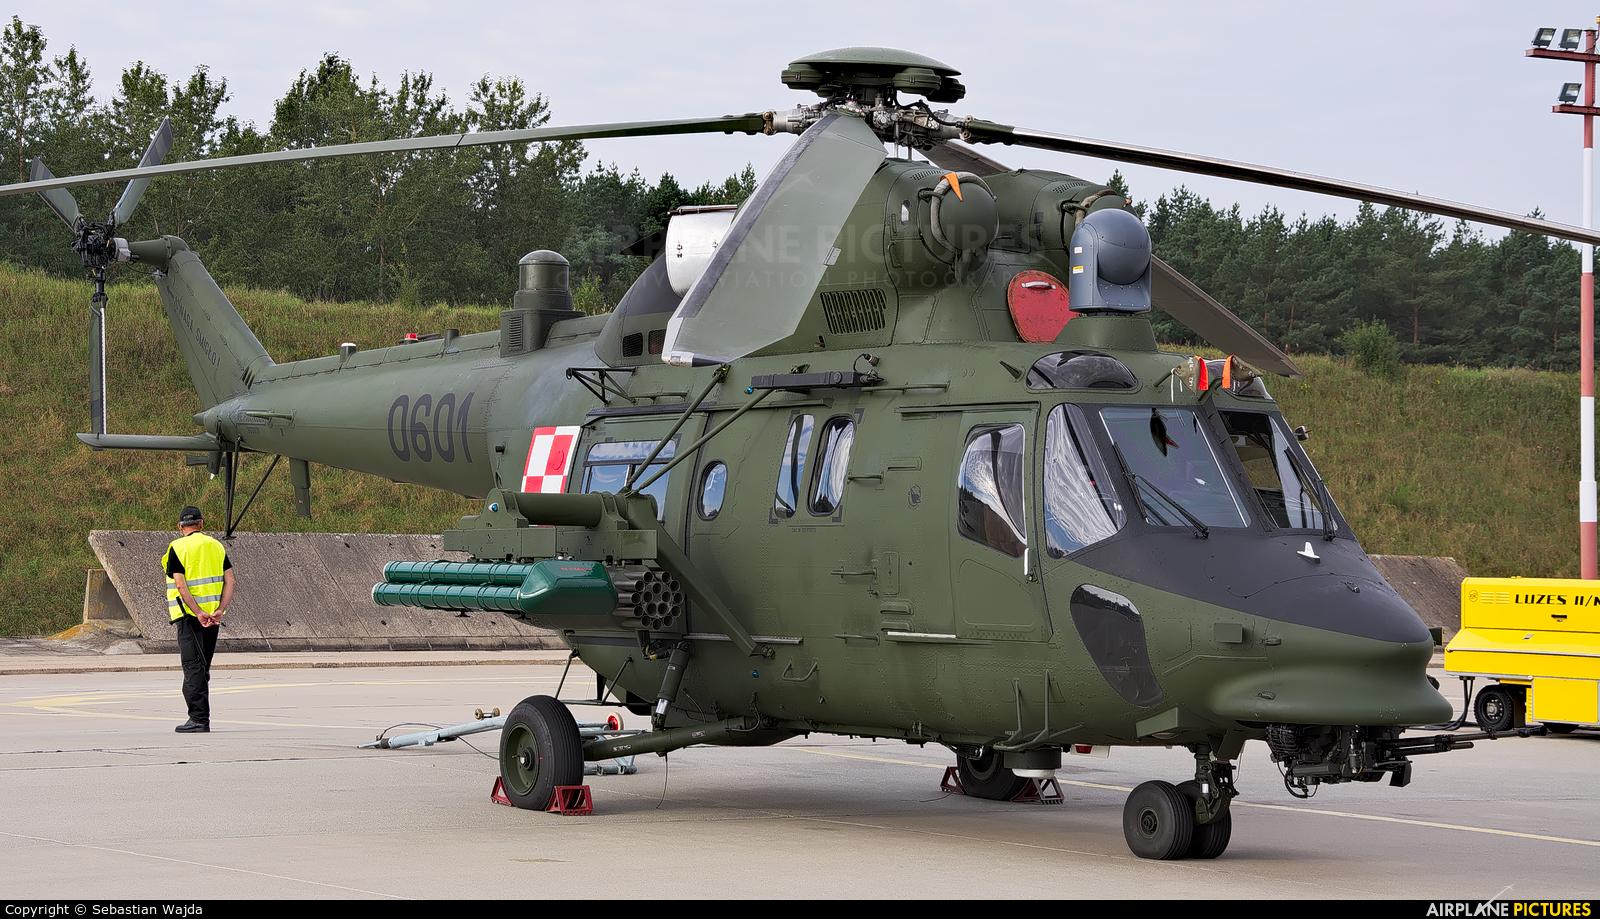 Poland - Army 0601 aircraft at Mirosławiec